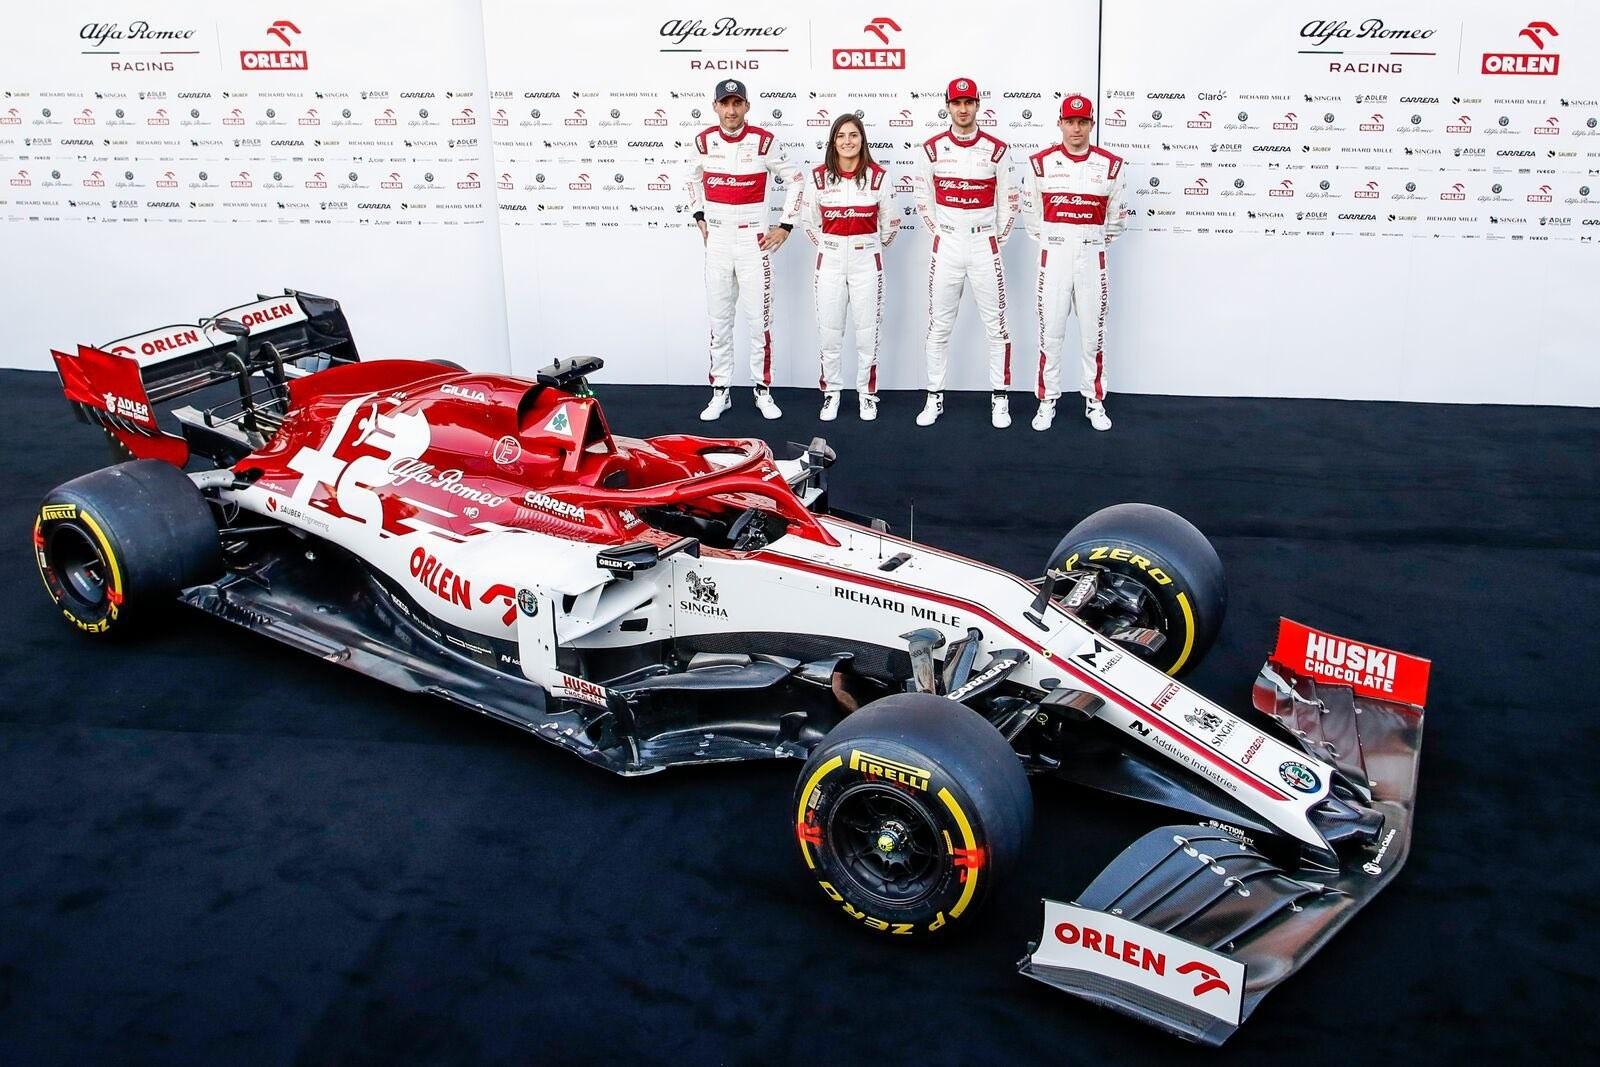 F1阿尔法·罗密欧新车C39亮相